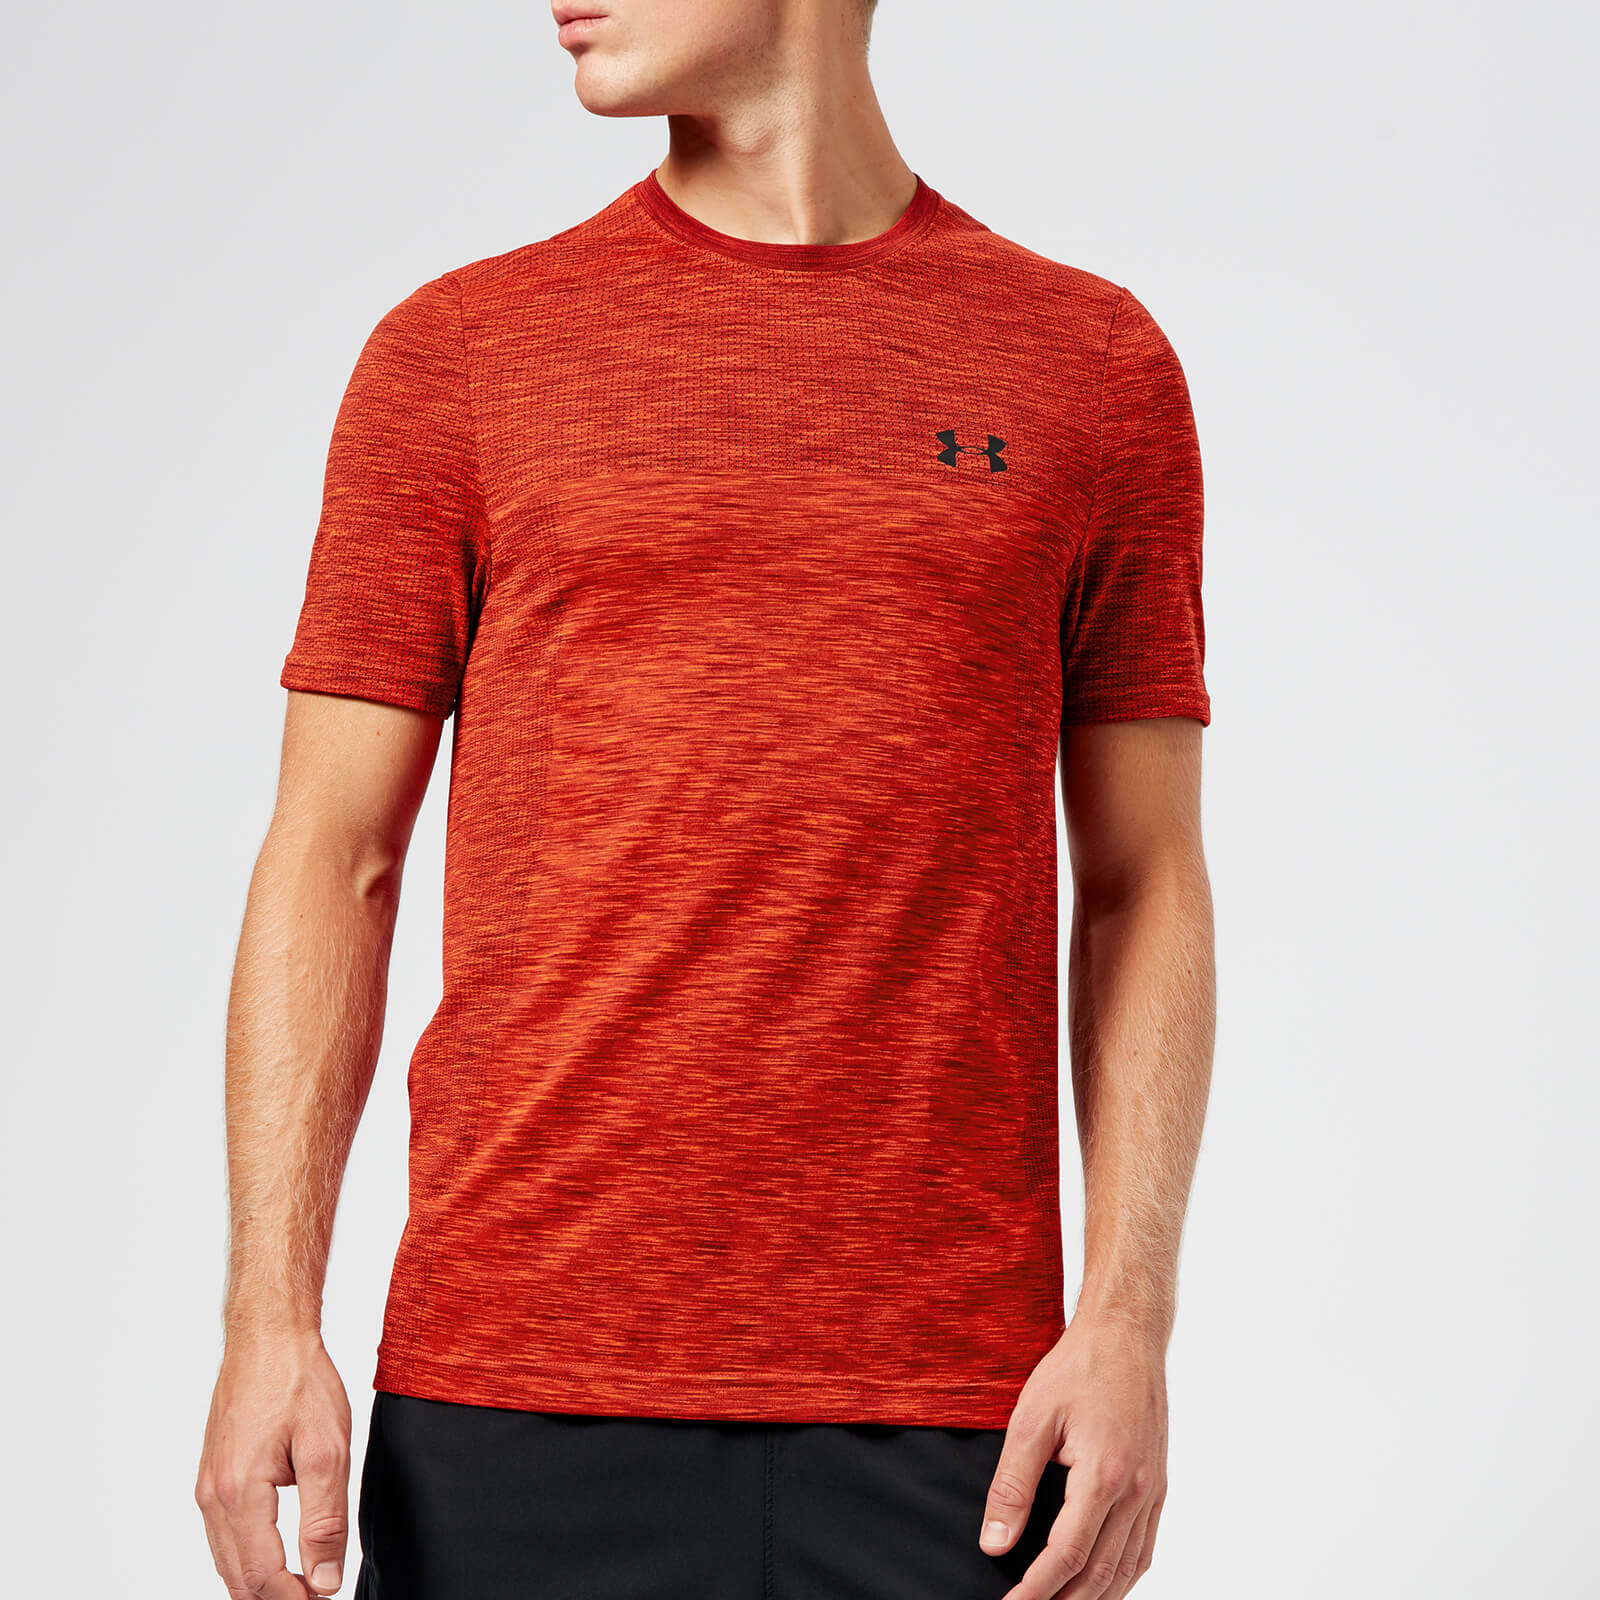 ca4d026a9 Under Armour Men's Vanish Seamless Short Sleeve T-Shirt - Radio Red Sports  & Leisure | TheHut.com